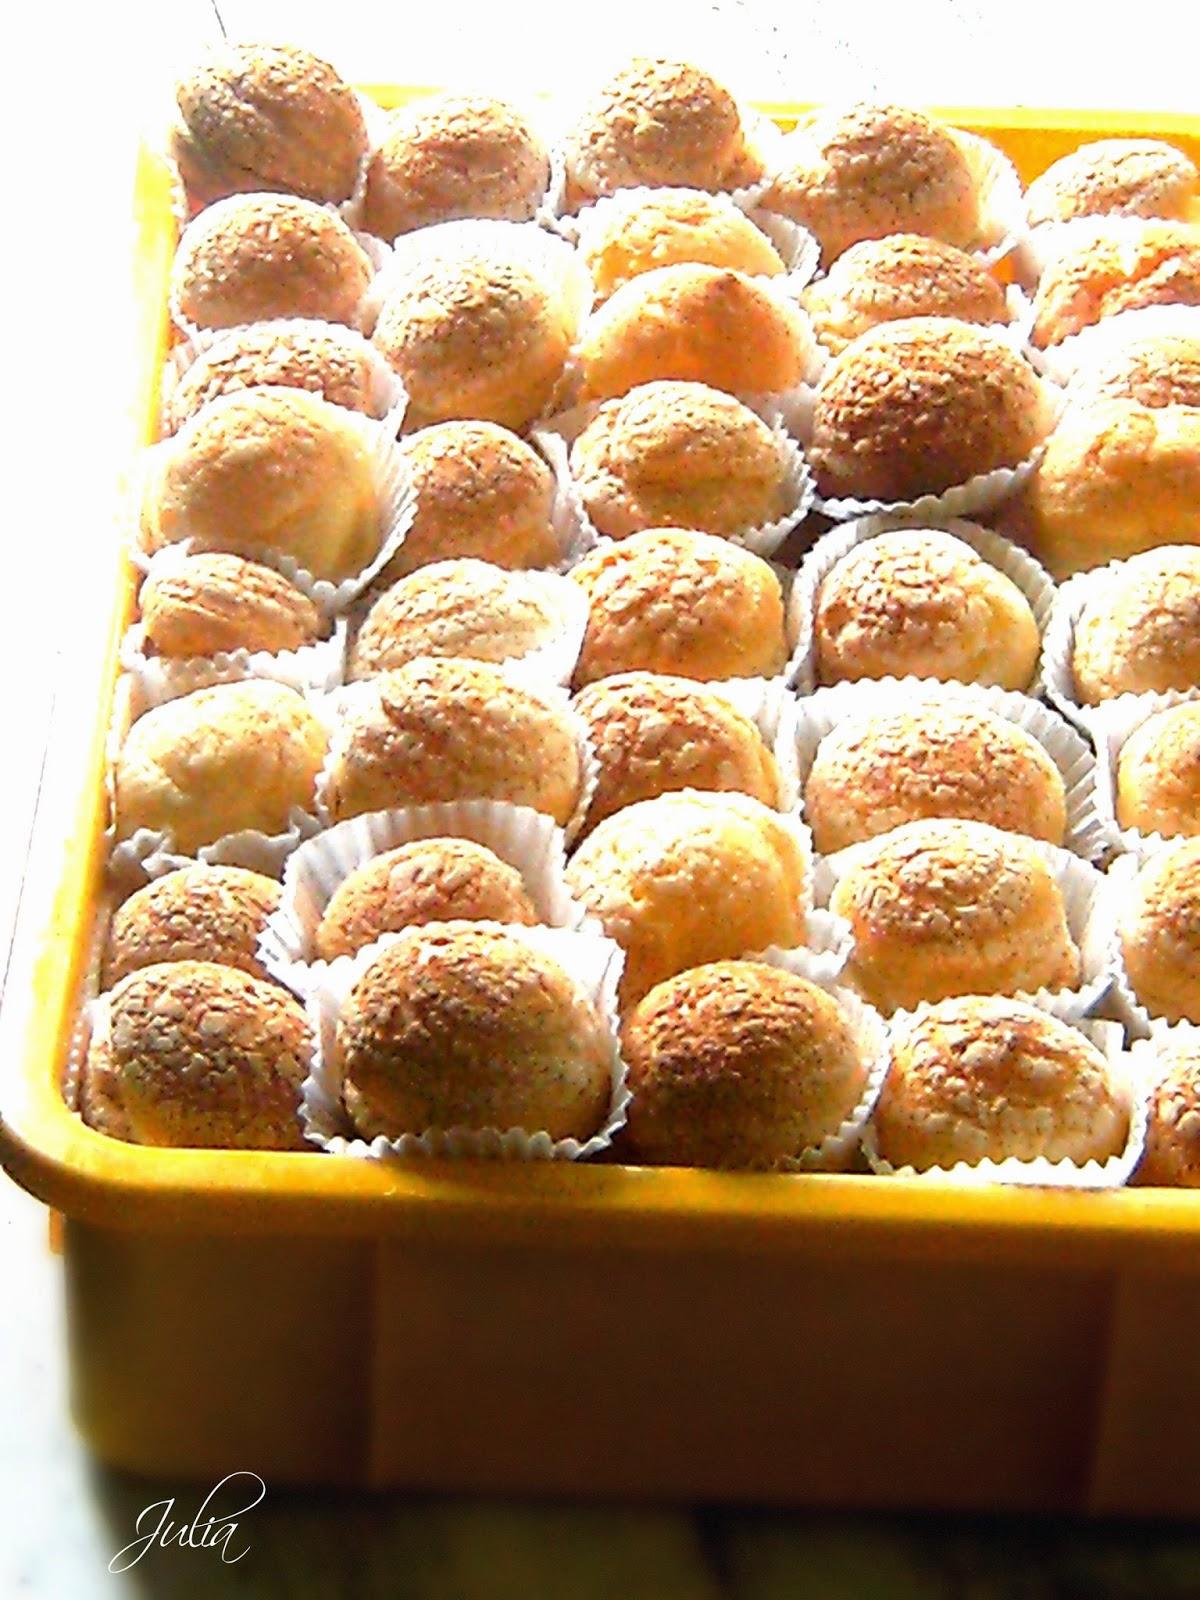 Cream Puff Utk Majlis